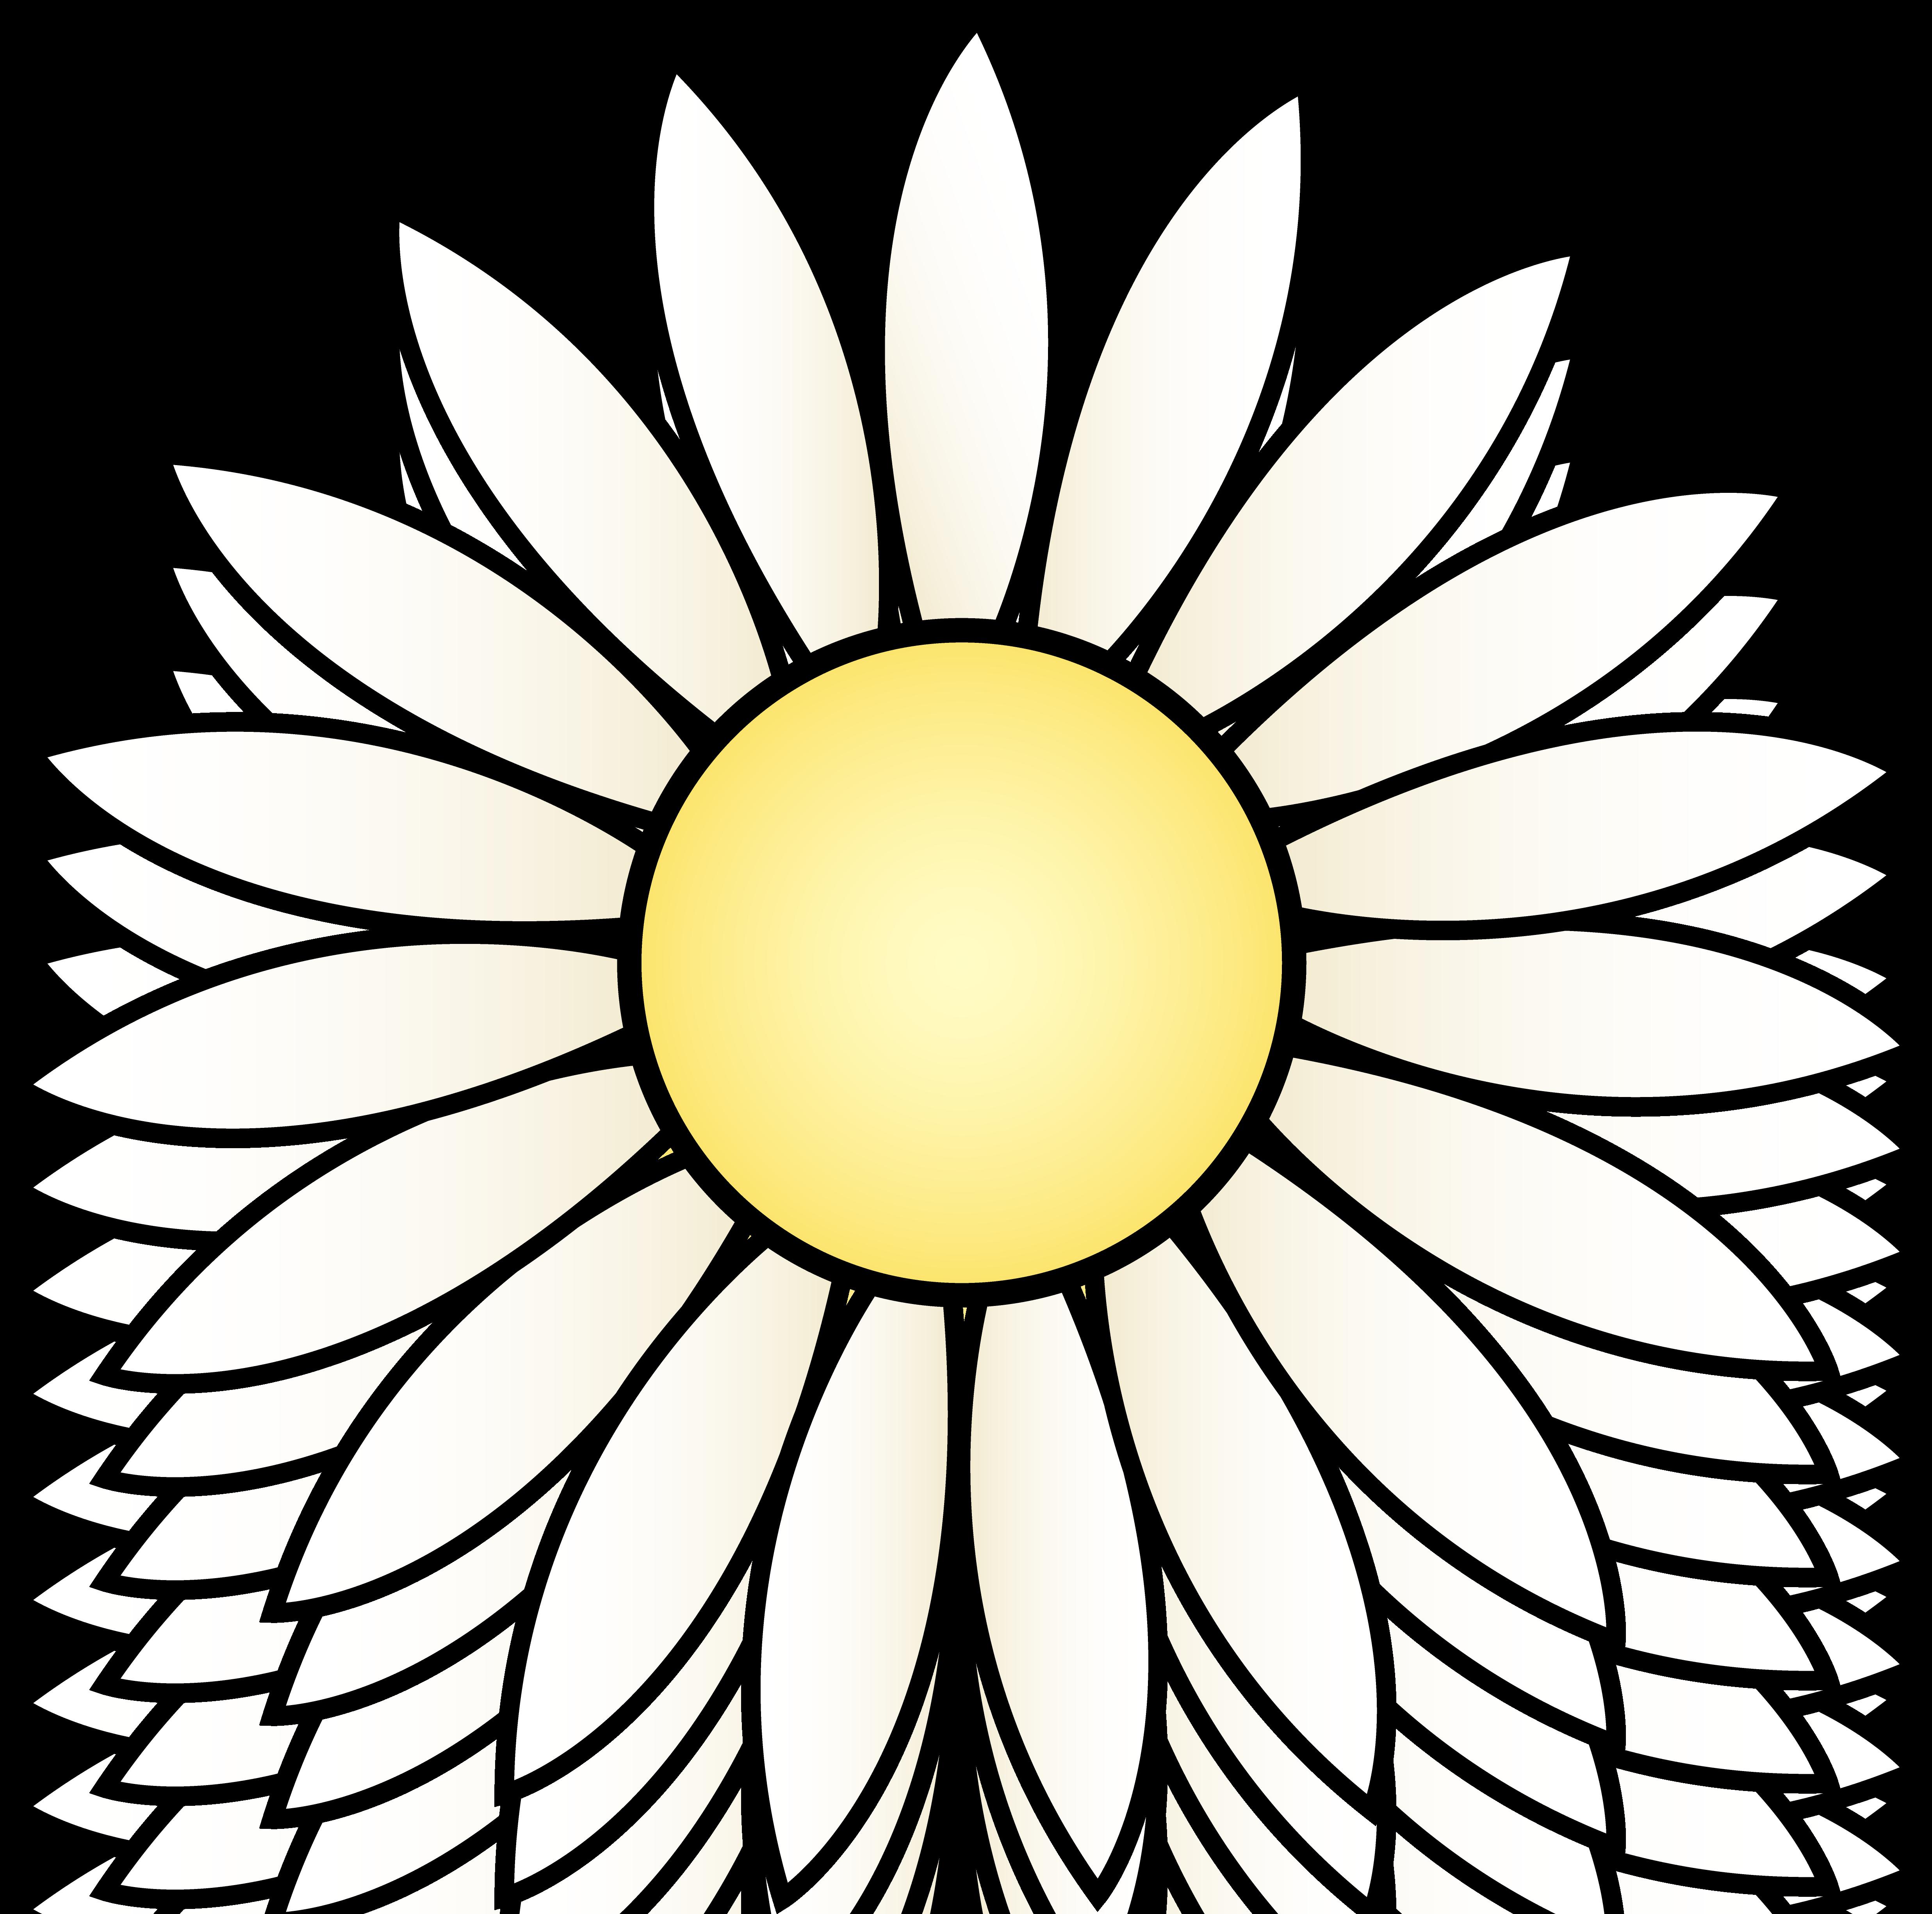 4948x4901 Petals Daisy Clipart, Explore Pictures